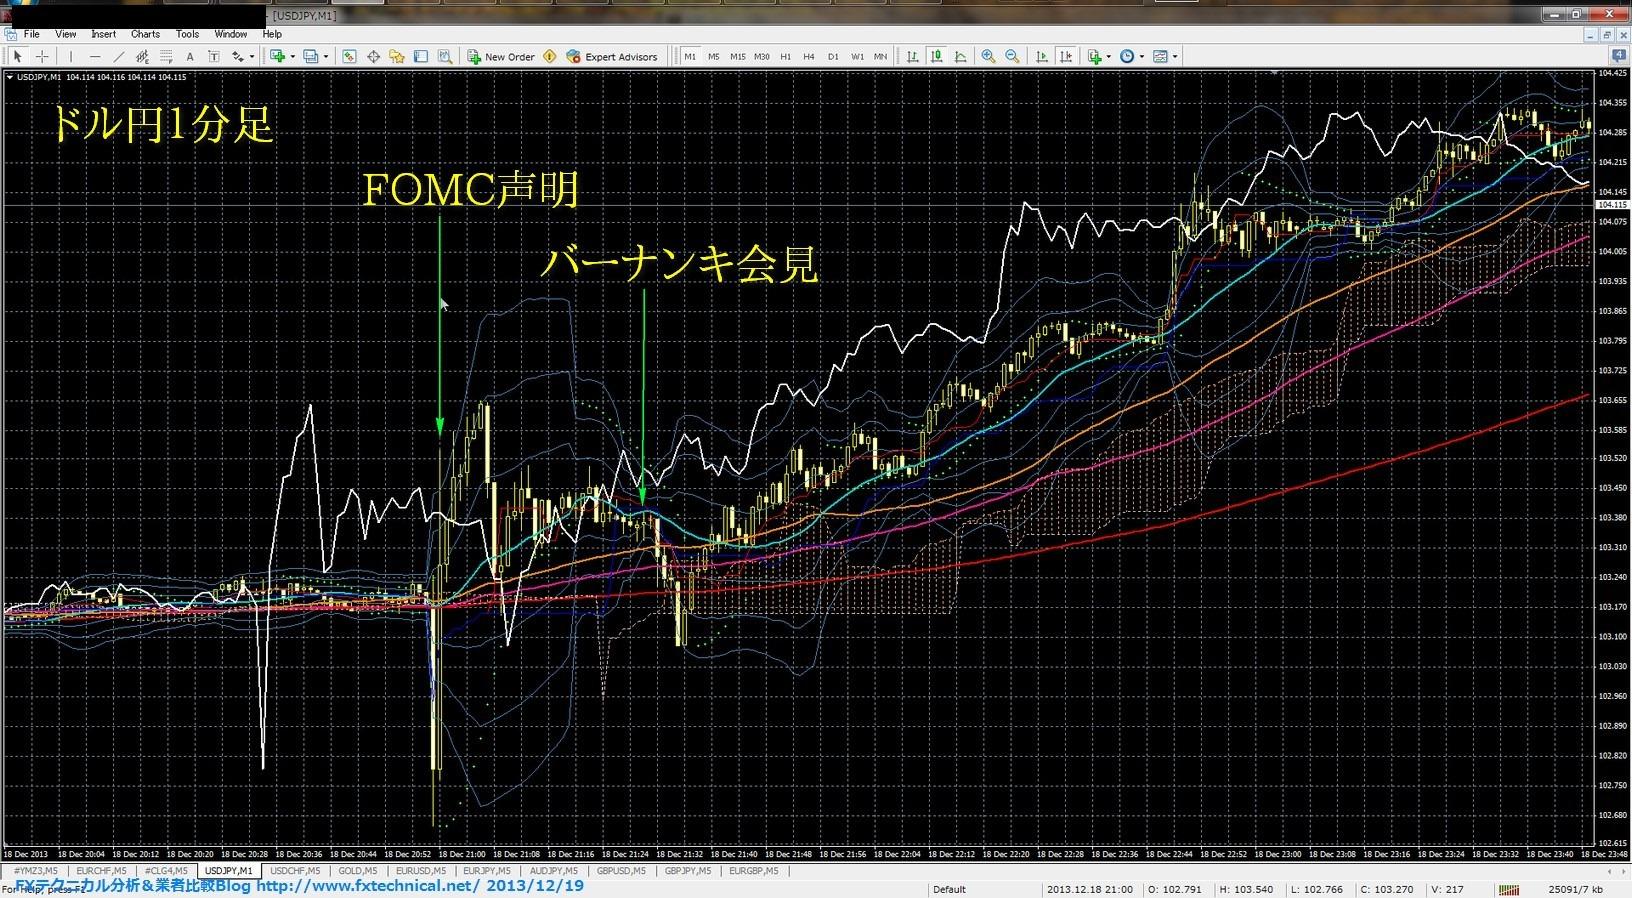 Fomc forex live